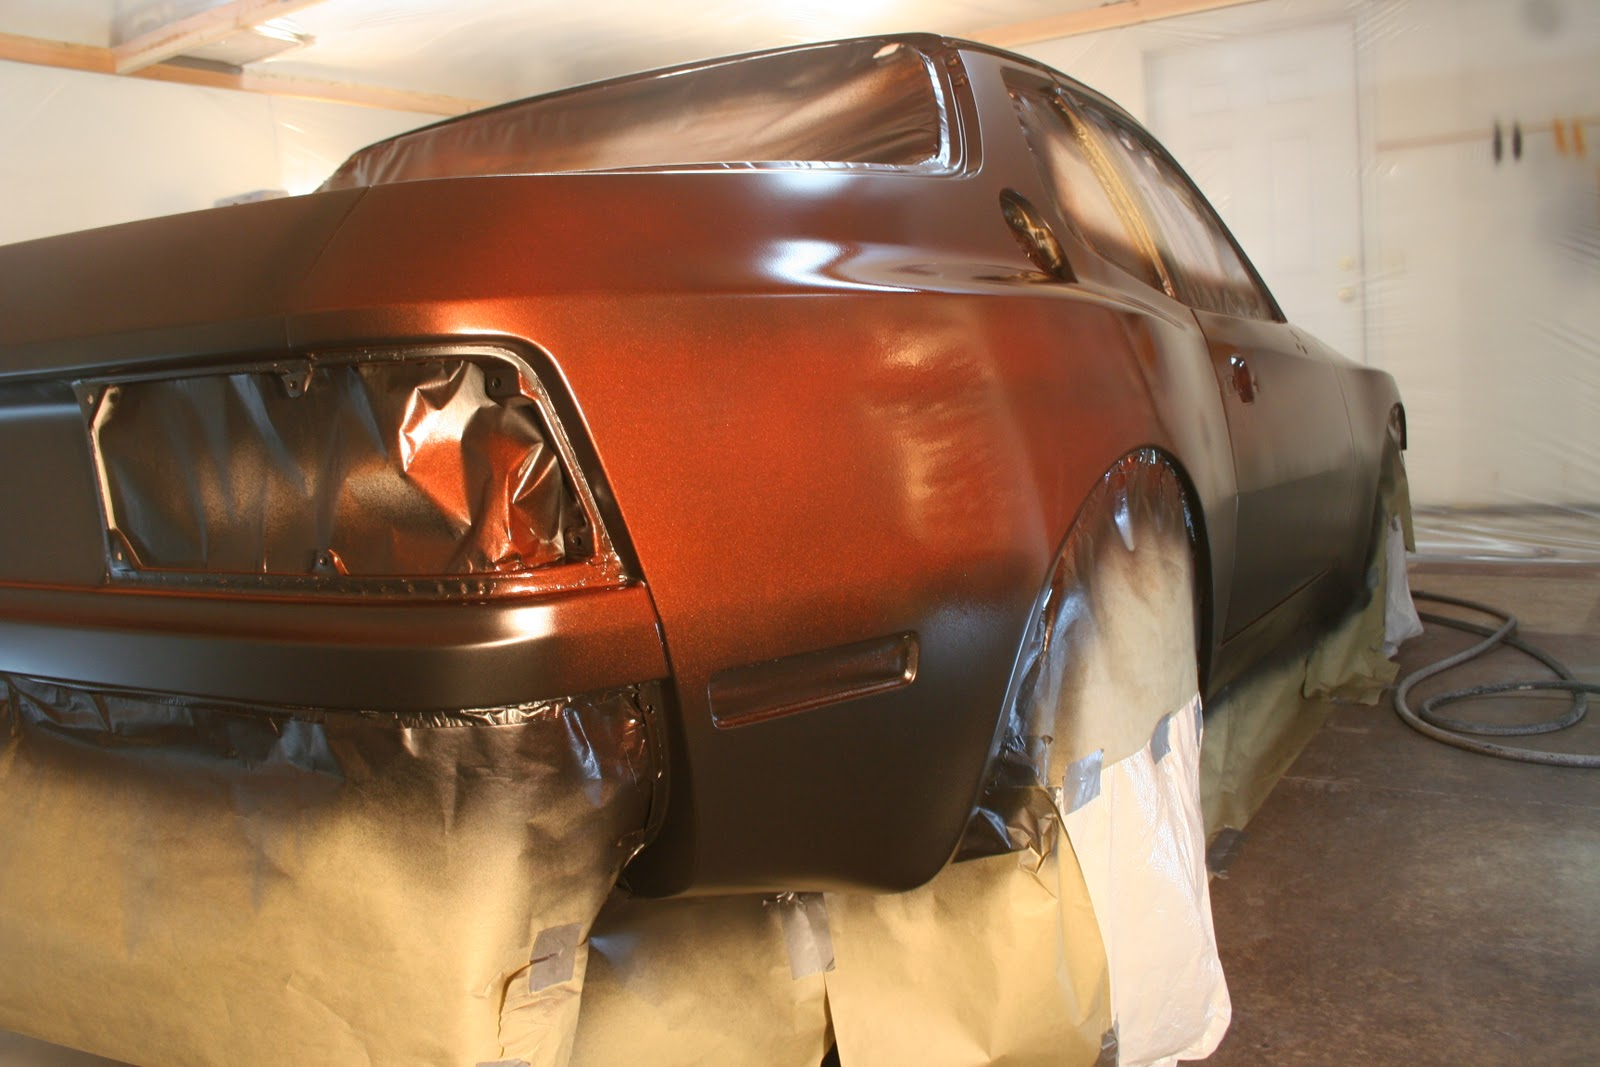 repainting my 1983 porsche 944 spraying color part 1. Black Bedroom Furniture Sets. Home Design Ideas